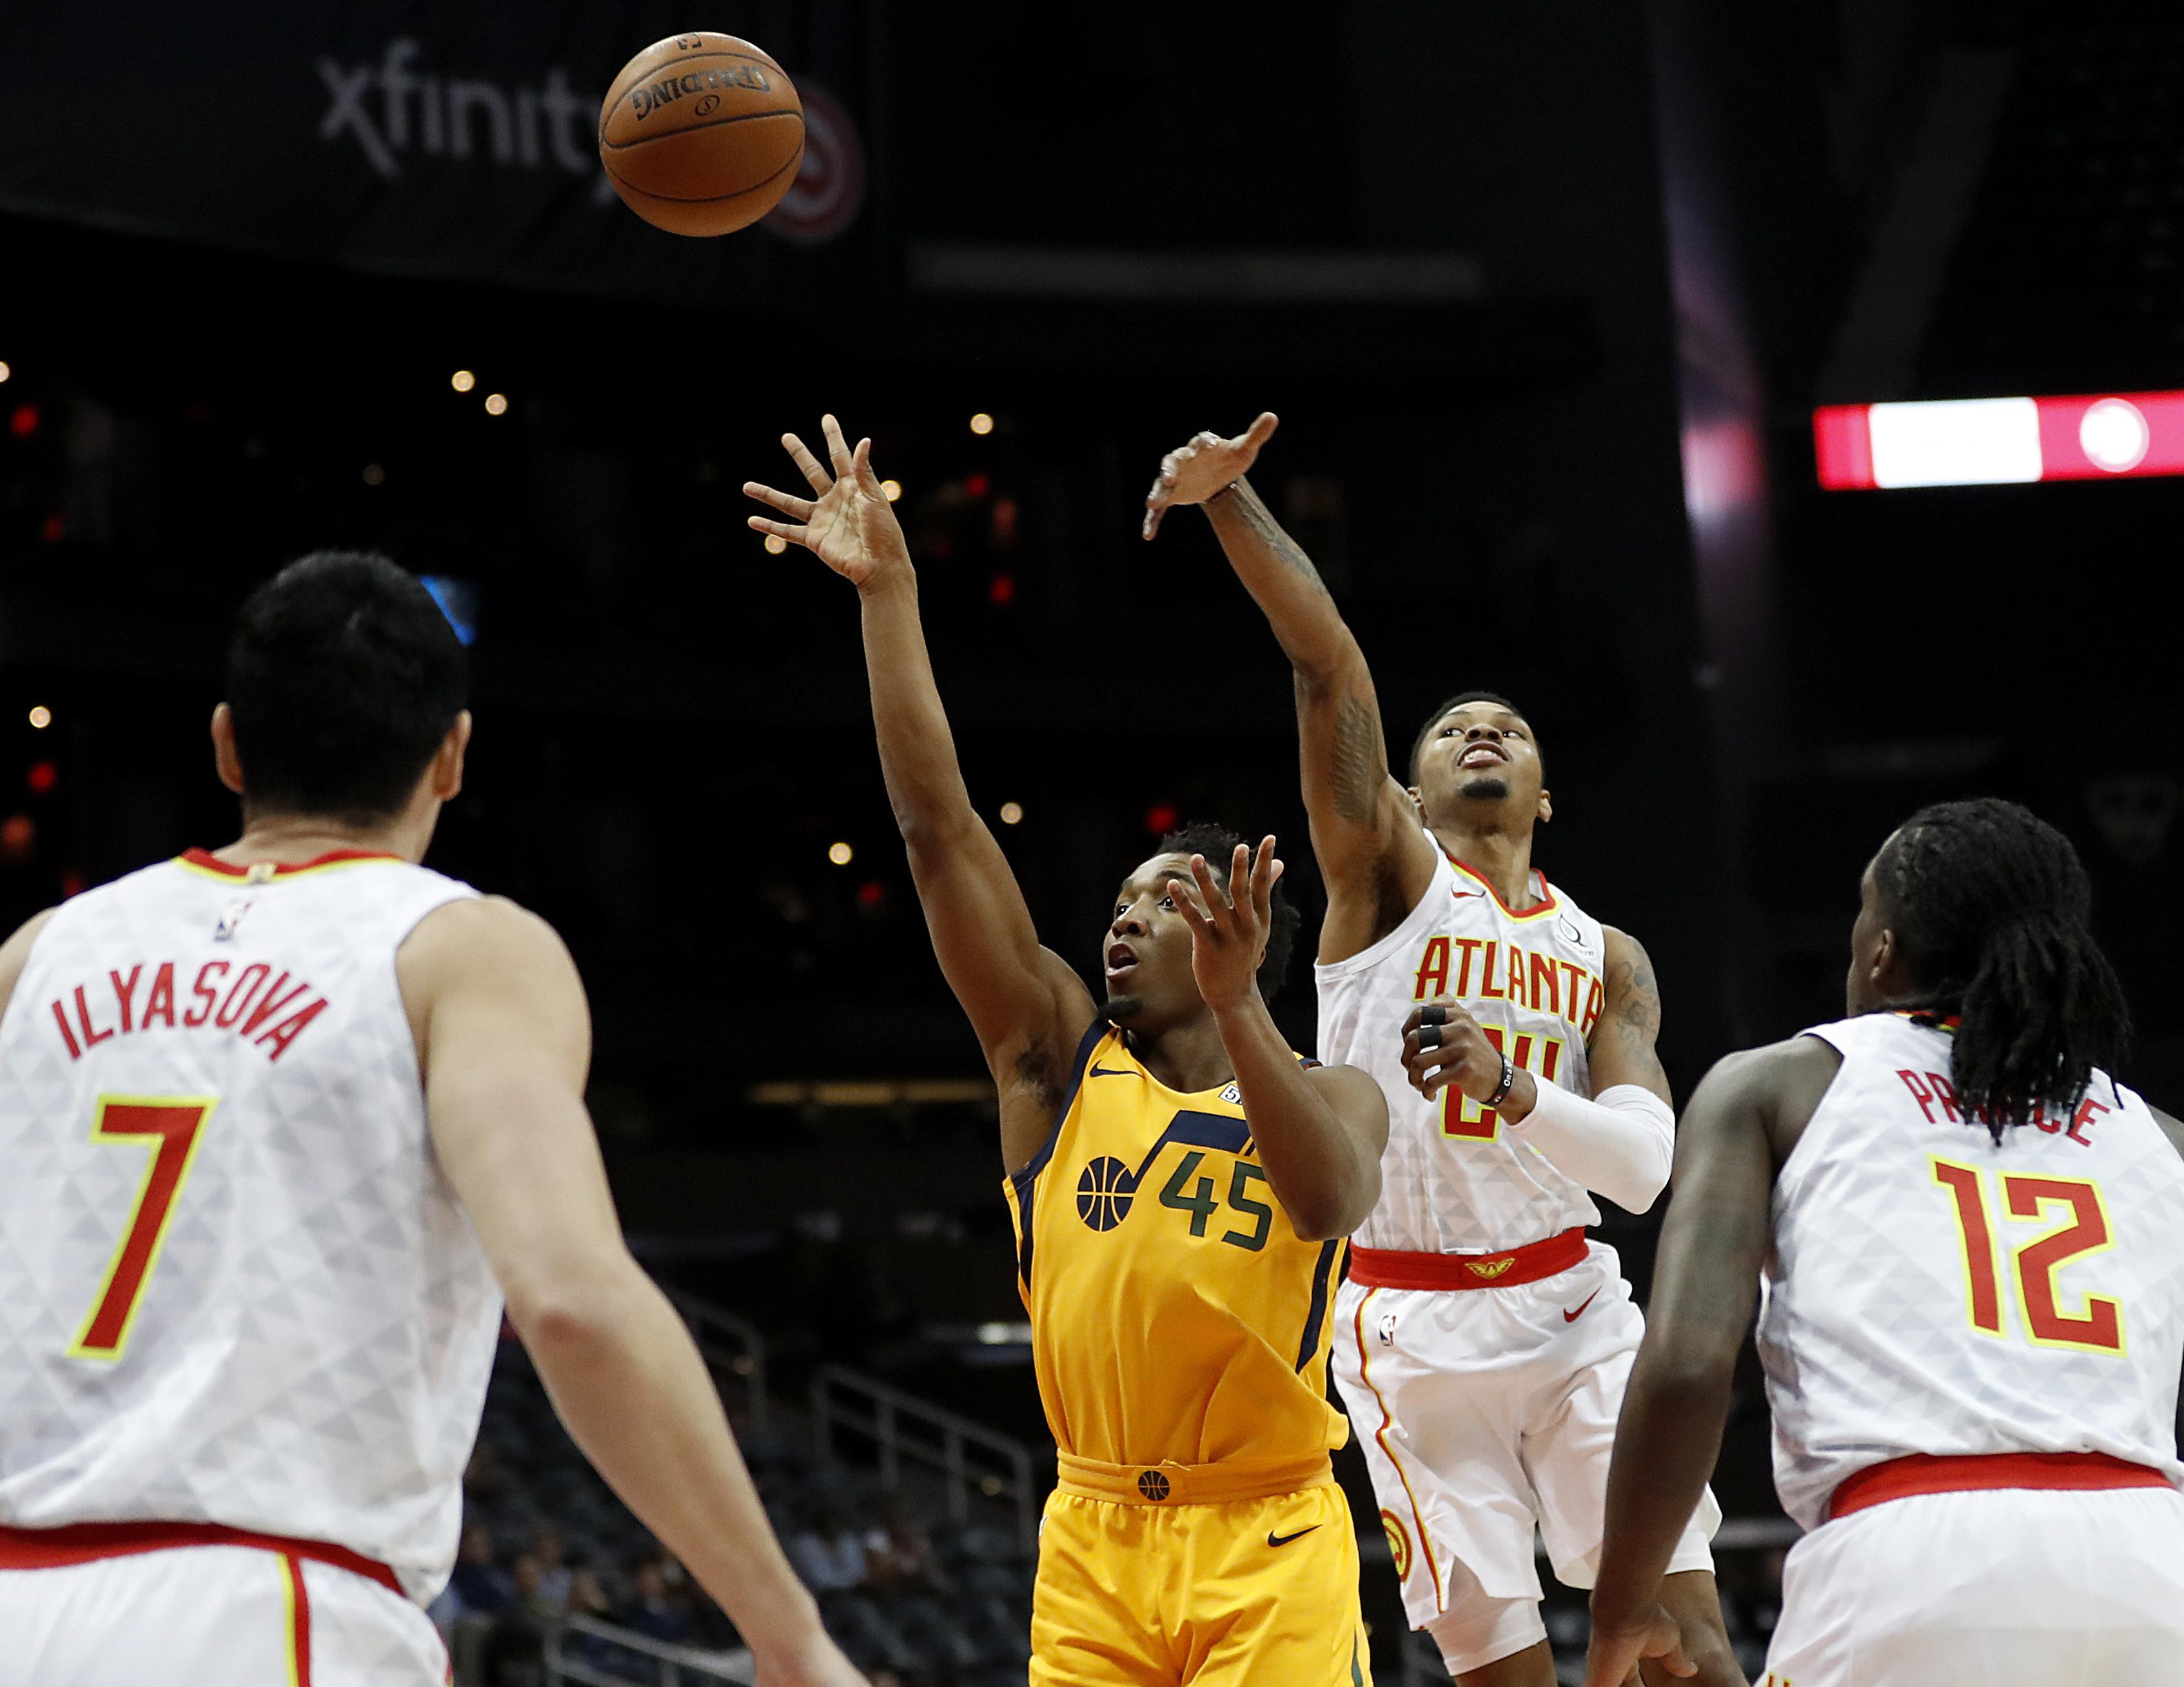 Jazz collapse in third quarter, fall to Atlanta 104-90